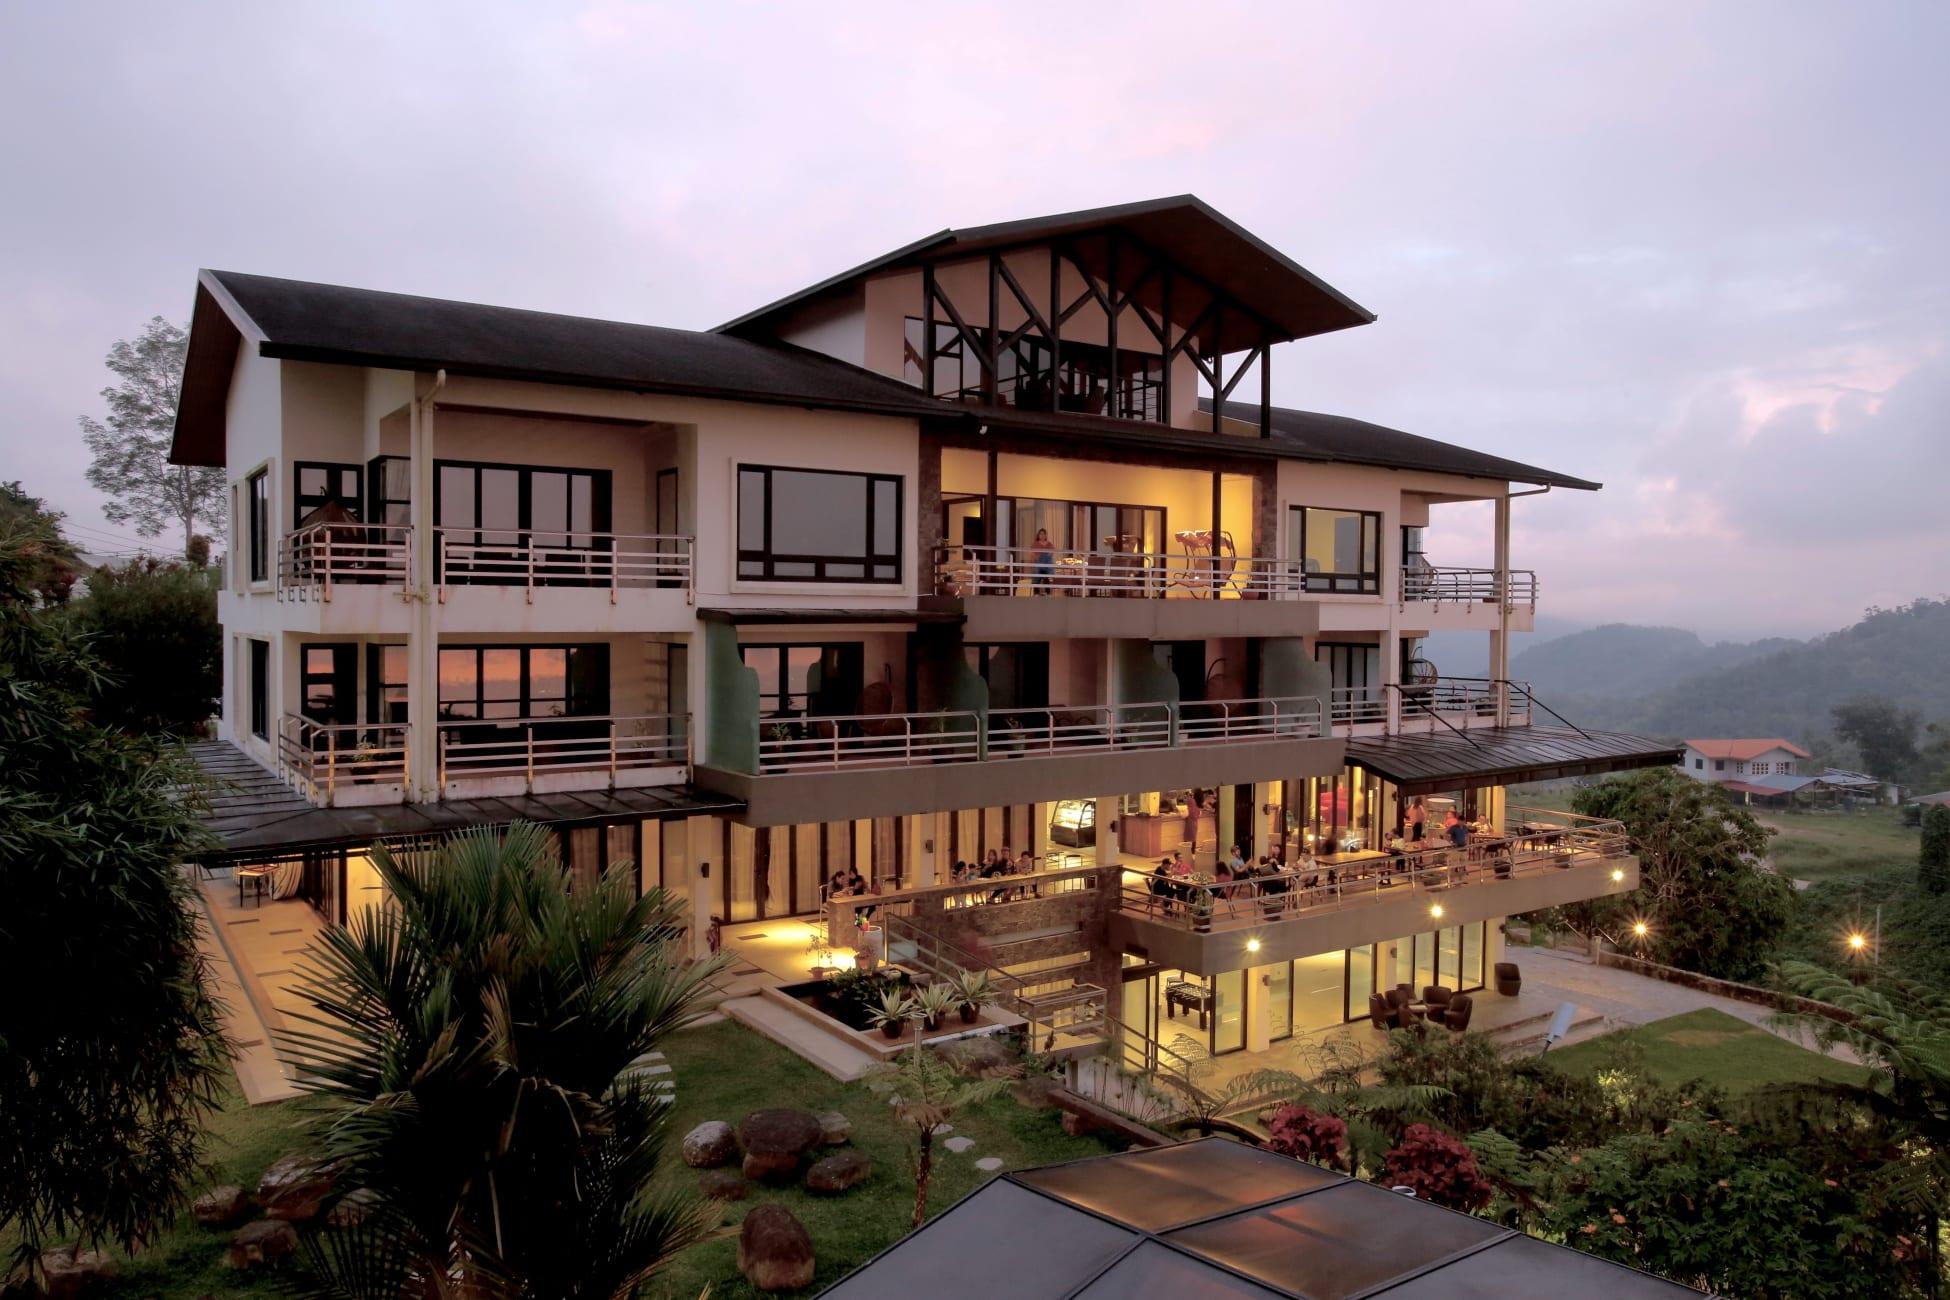 kota kinabalu resorts and hotels - kokol haven resort